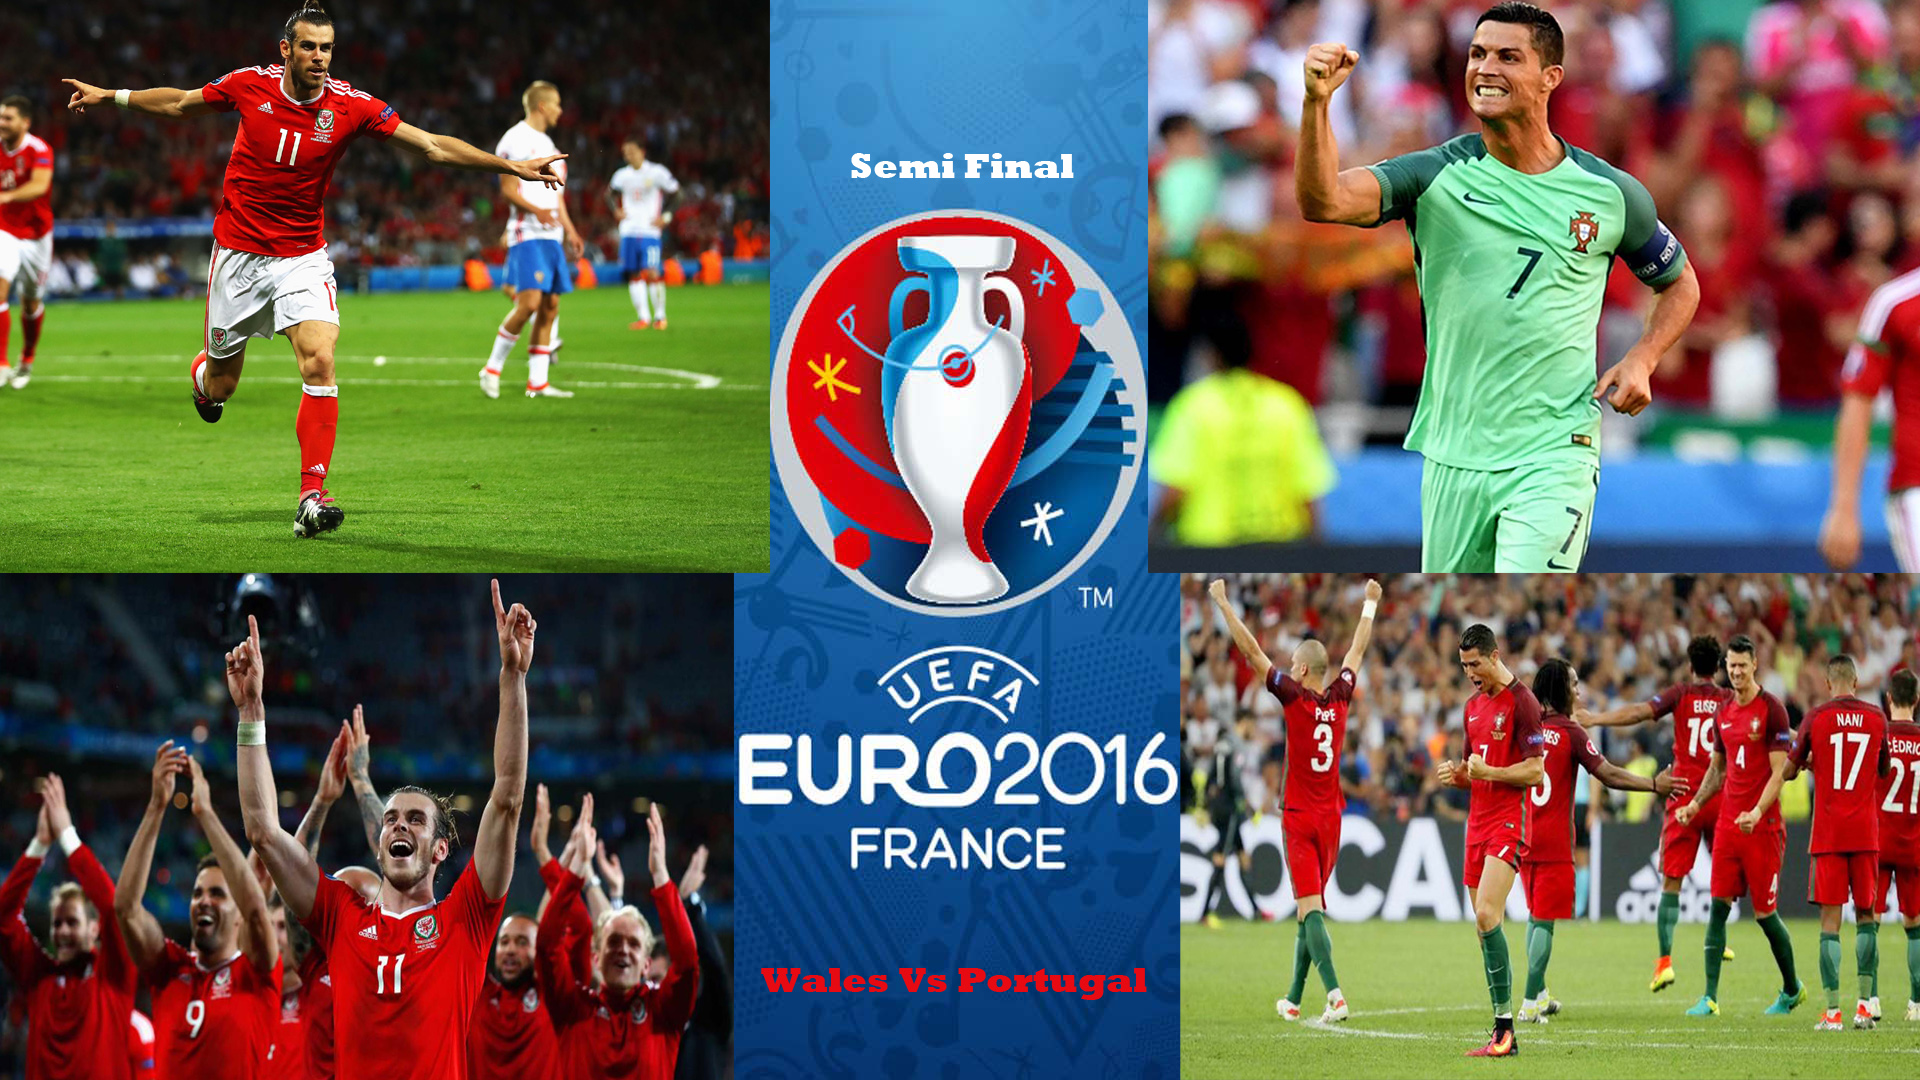 Euro 2016 Semi Final Wales Vs Portugal HD Wallpaper 1920x1080